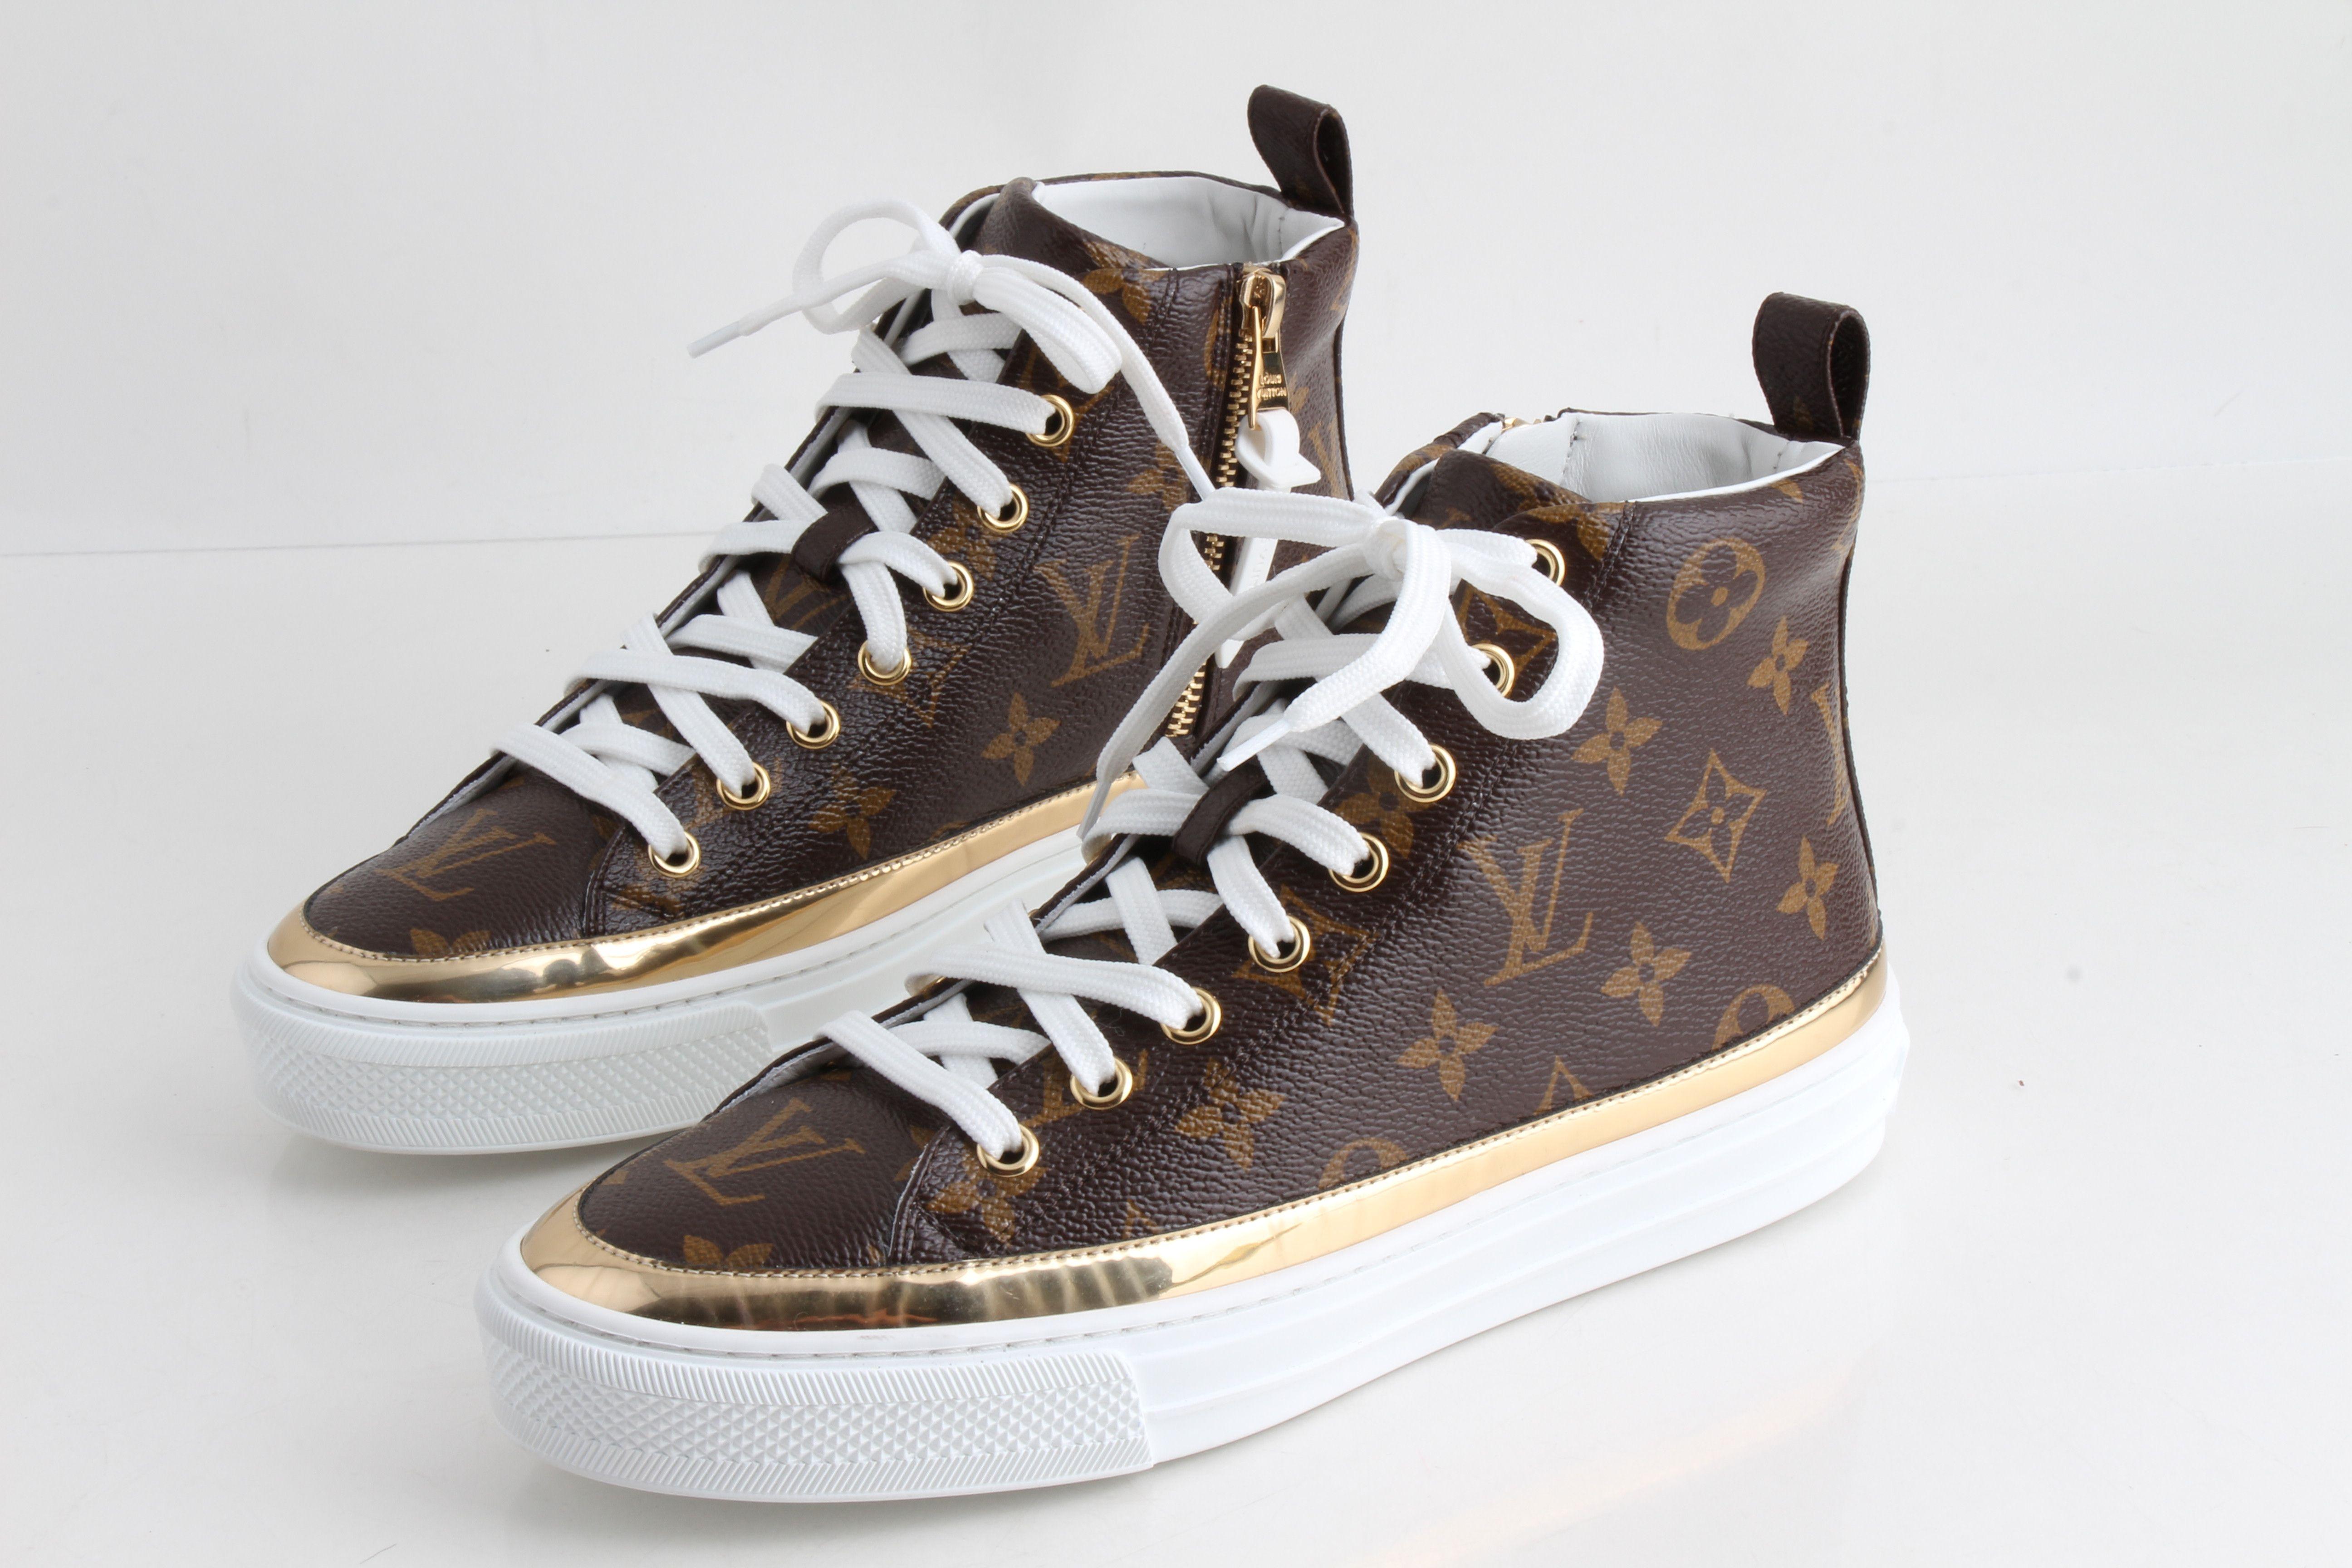 louis vuitton concorde sneaker